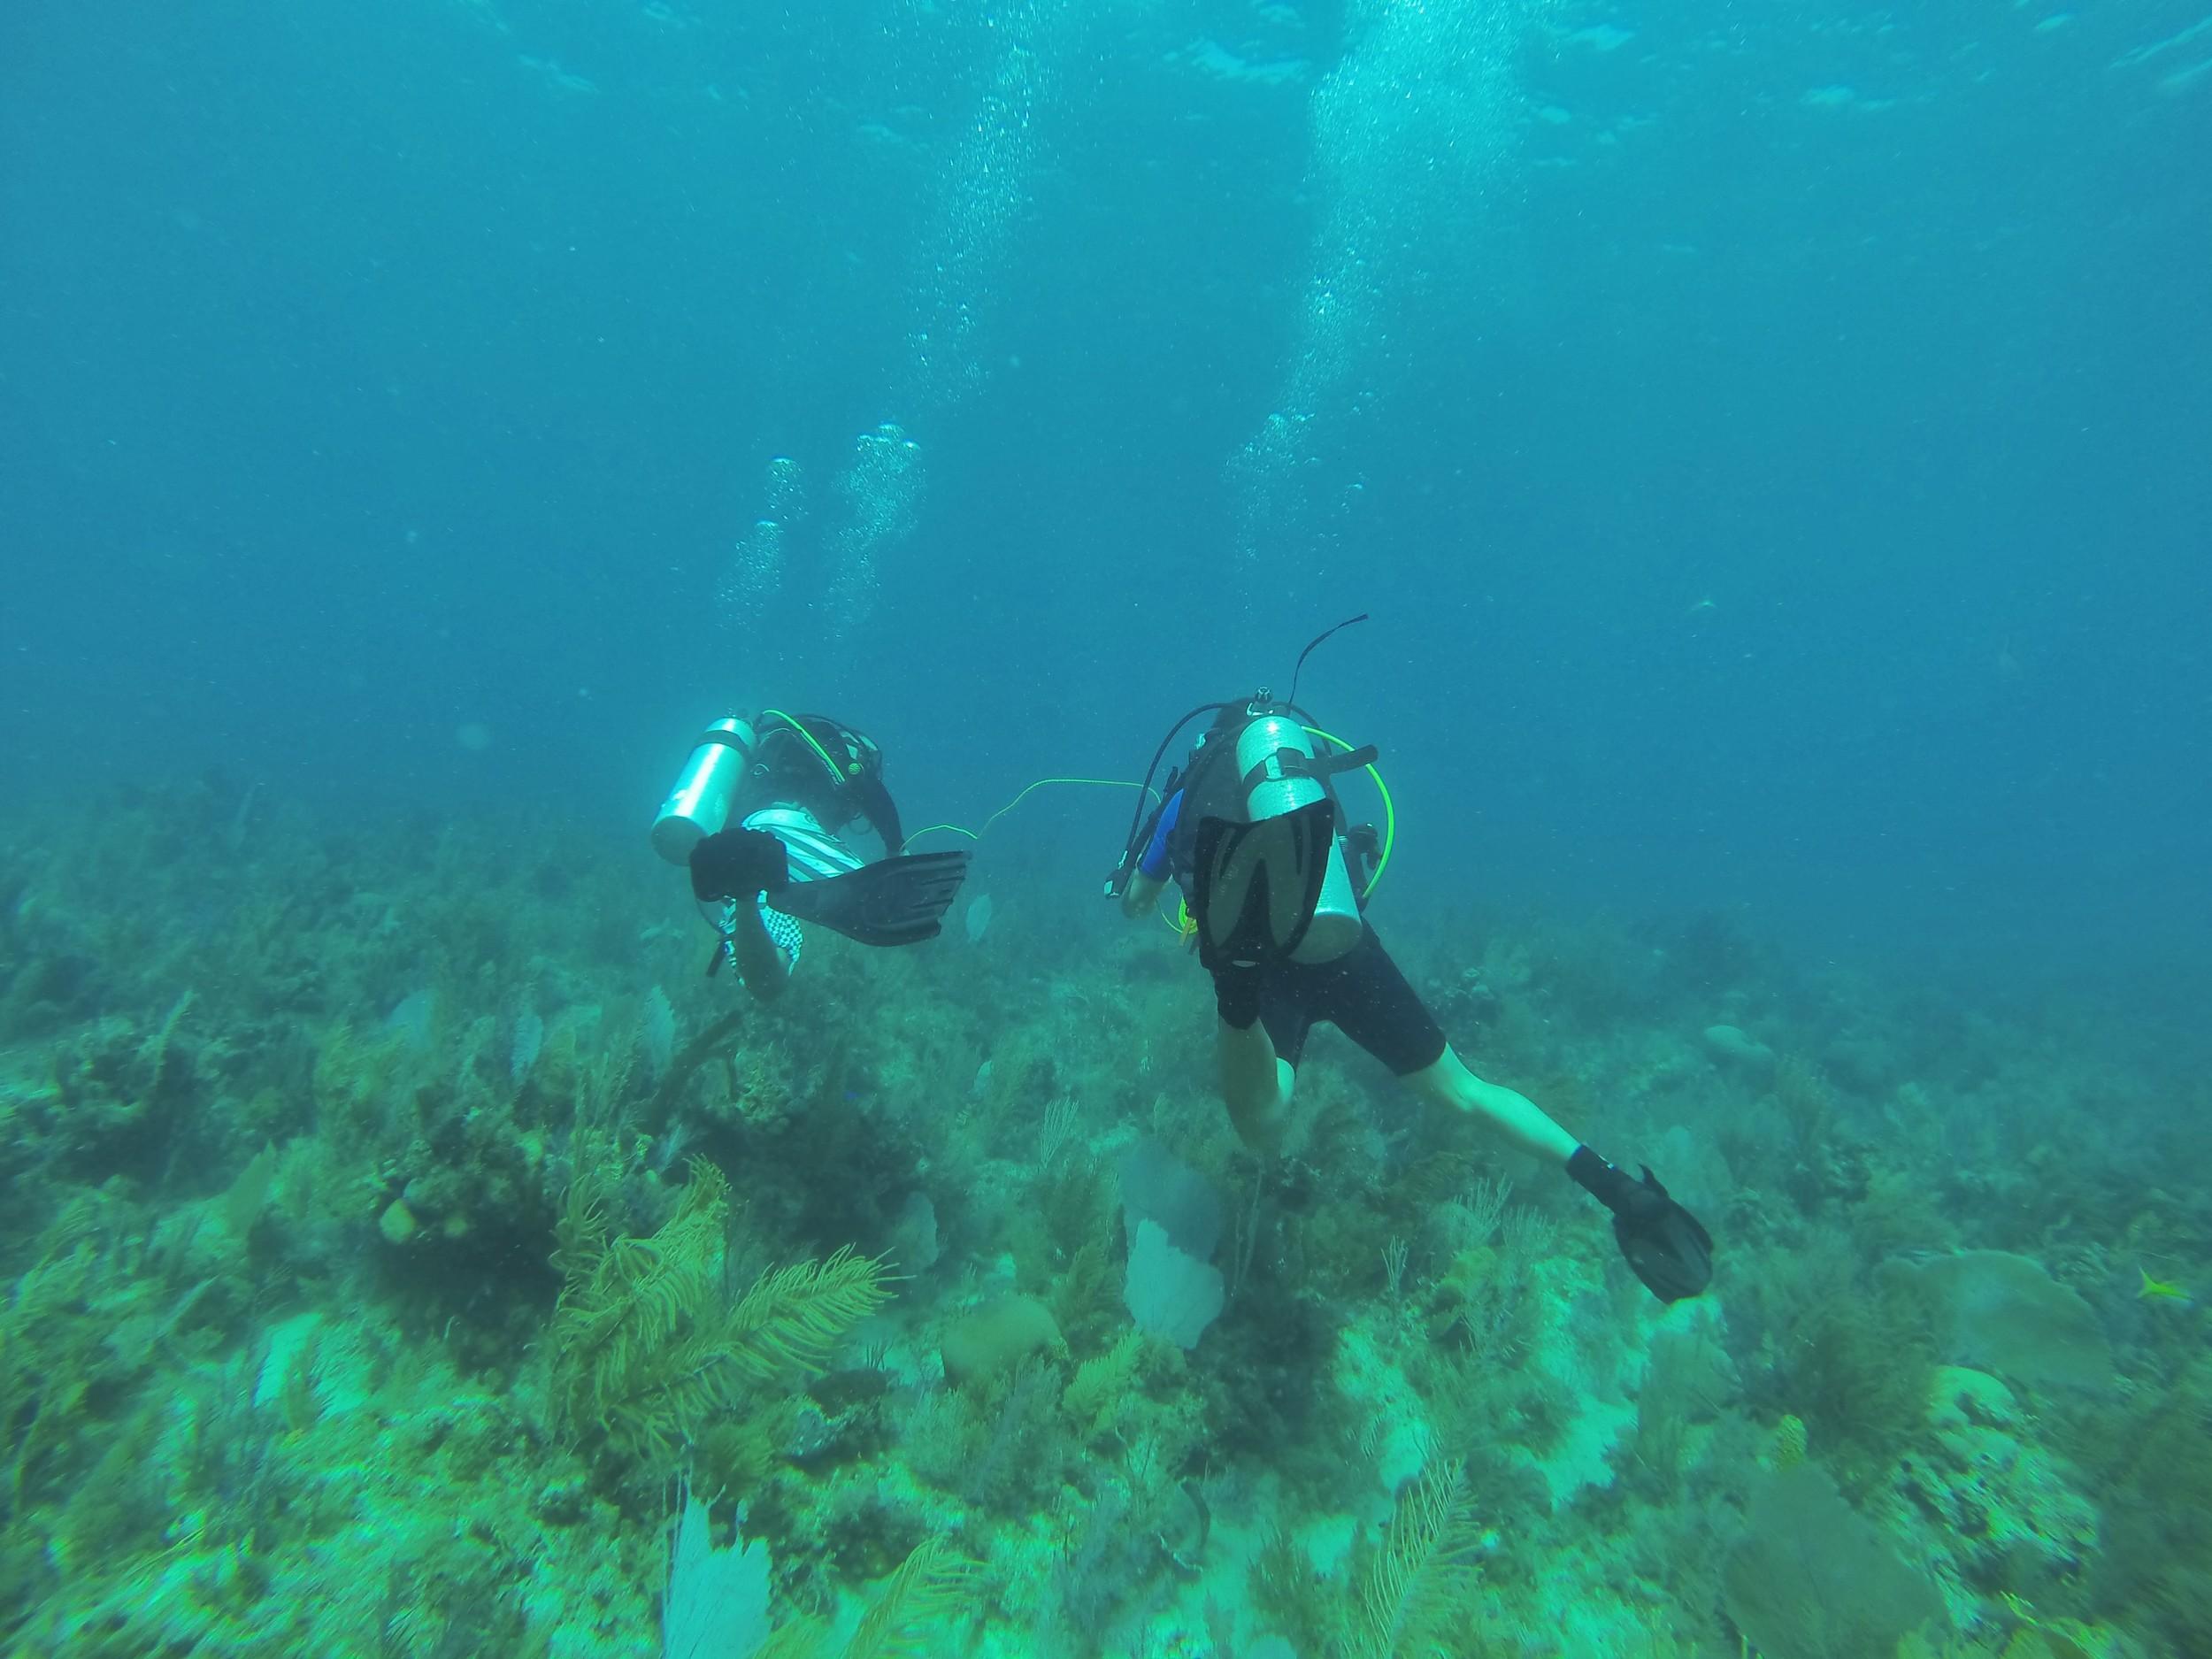 Swimming a transect, Jardines de la Reina, Cuba, 2013.